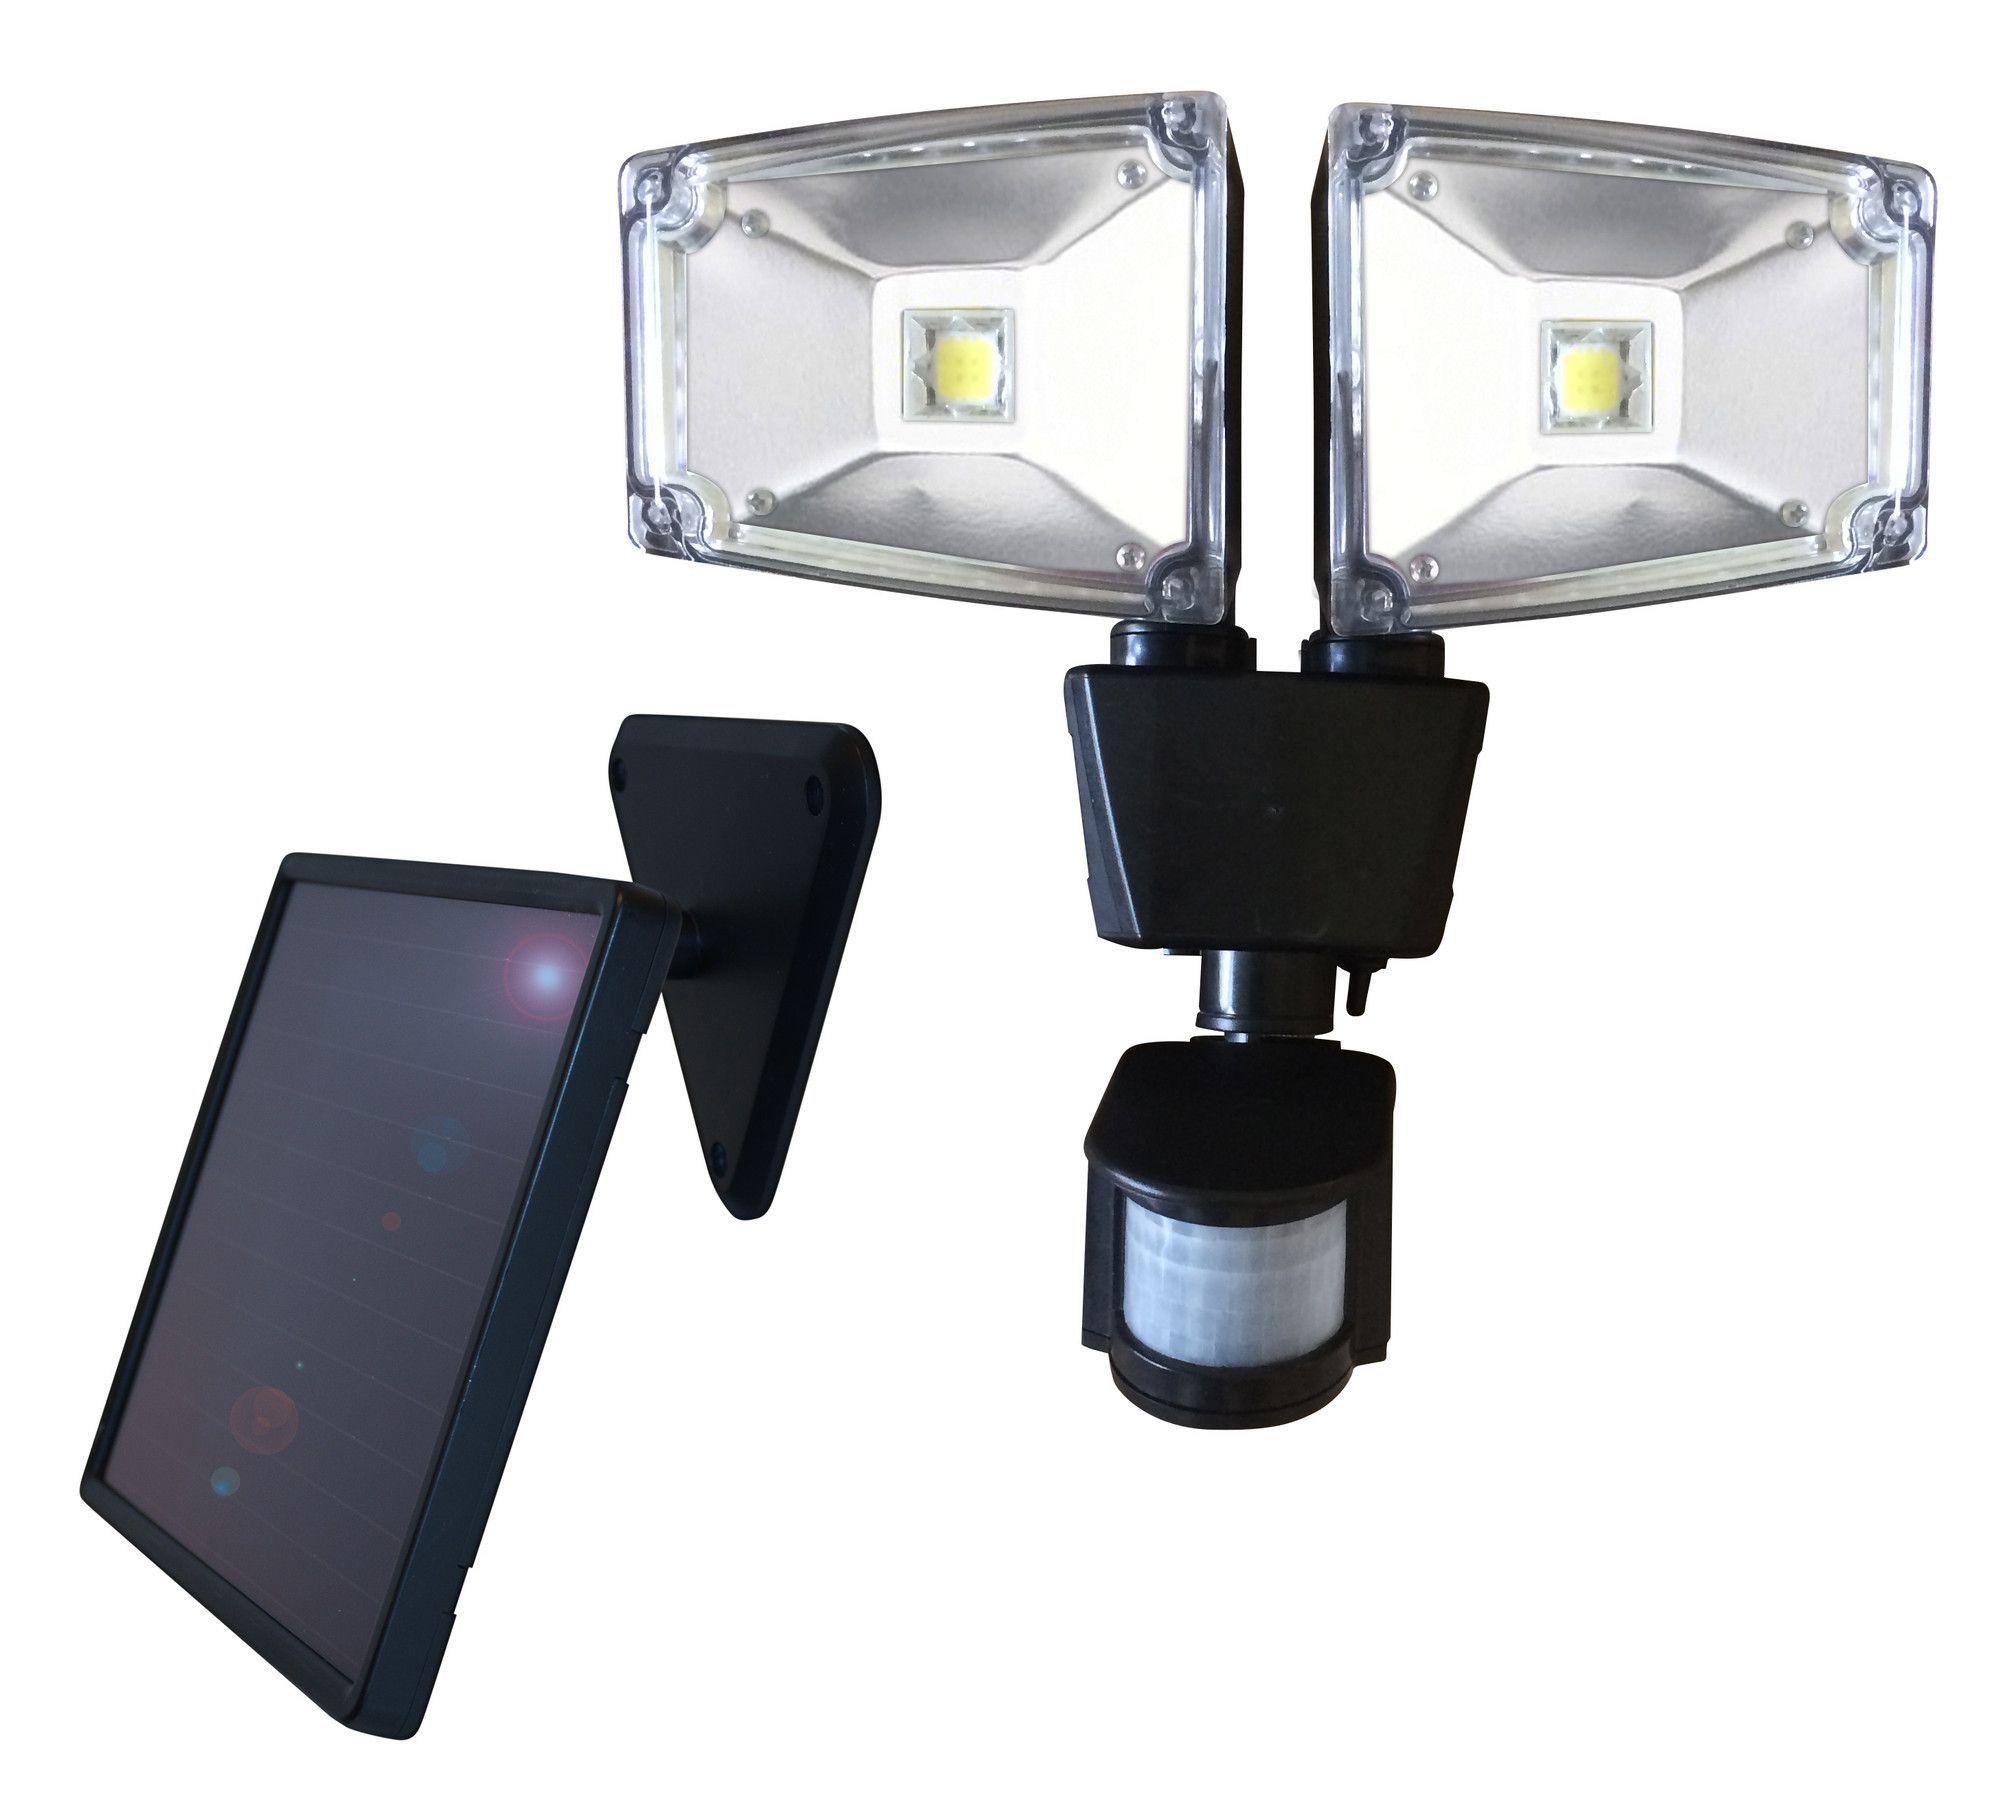 70 Watt Ledsolar Power Dusk To Dawn Flood Light With Motion Sensor Security Lights Outdoor Security Lights Led Flood Lights